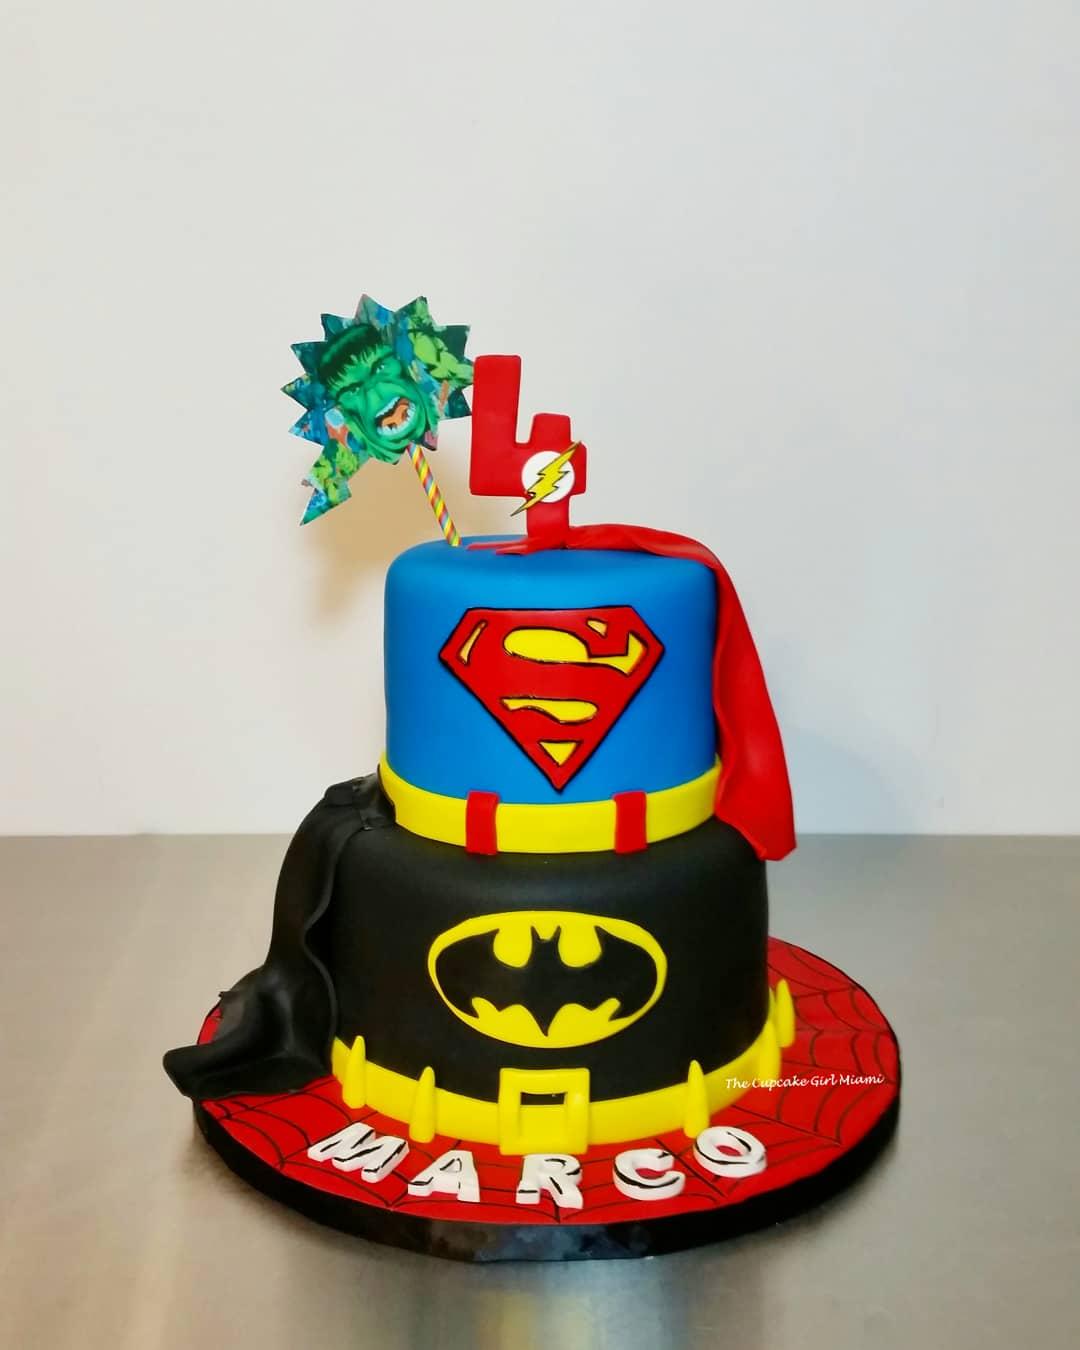 Fabulous Birthday Cakes Wedding Cakes Baby Shower Cakes The Cupcake Funny Birthday Cards Online Hendilapandamsfinfo